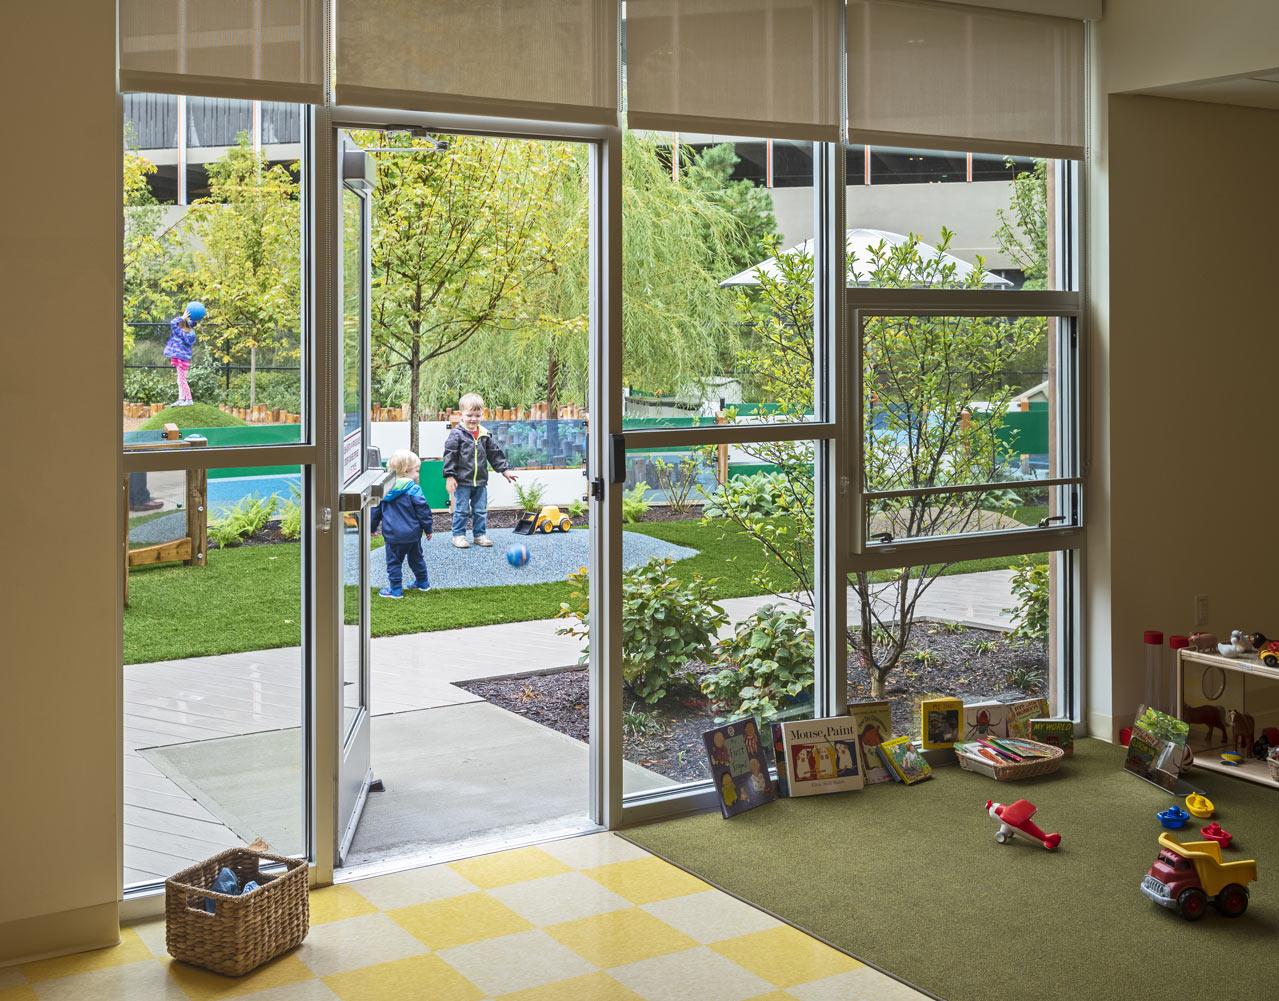 Partners-Childcare_landscape-playscape-interior-exterior-relationship_Klopfer-Martin.jpg